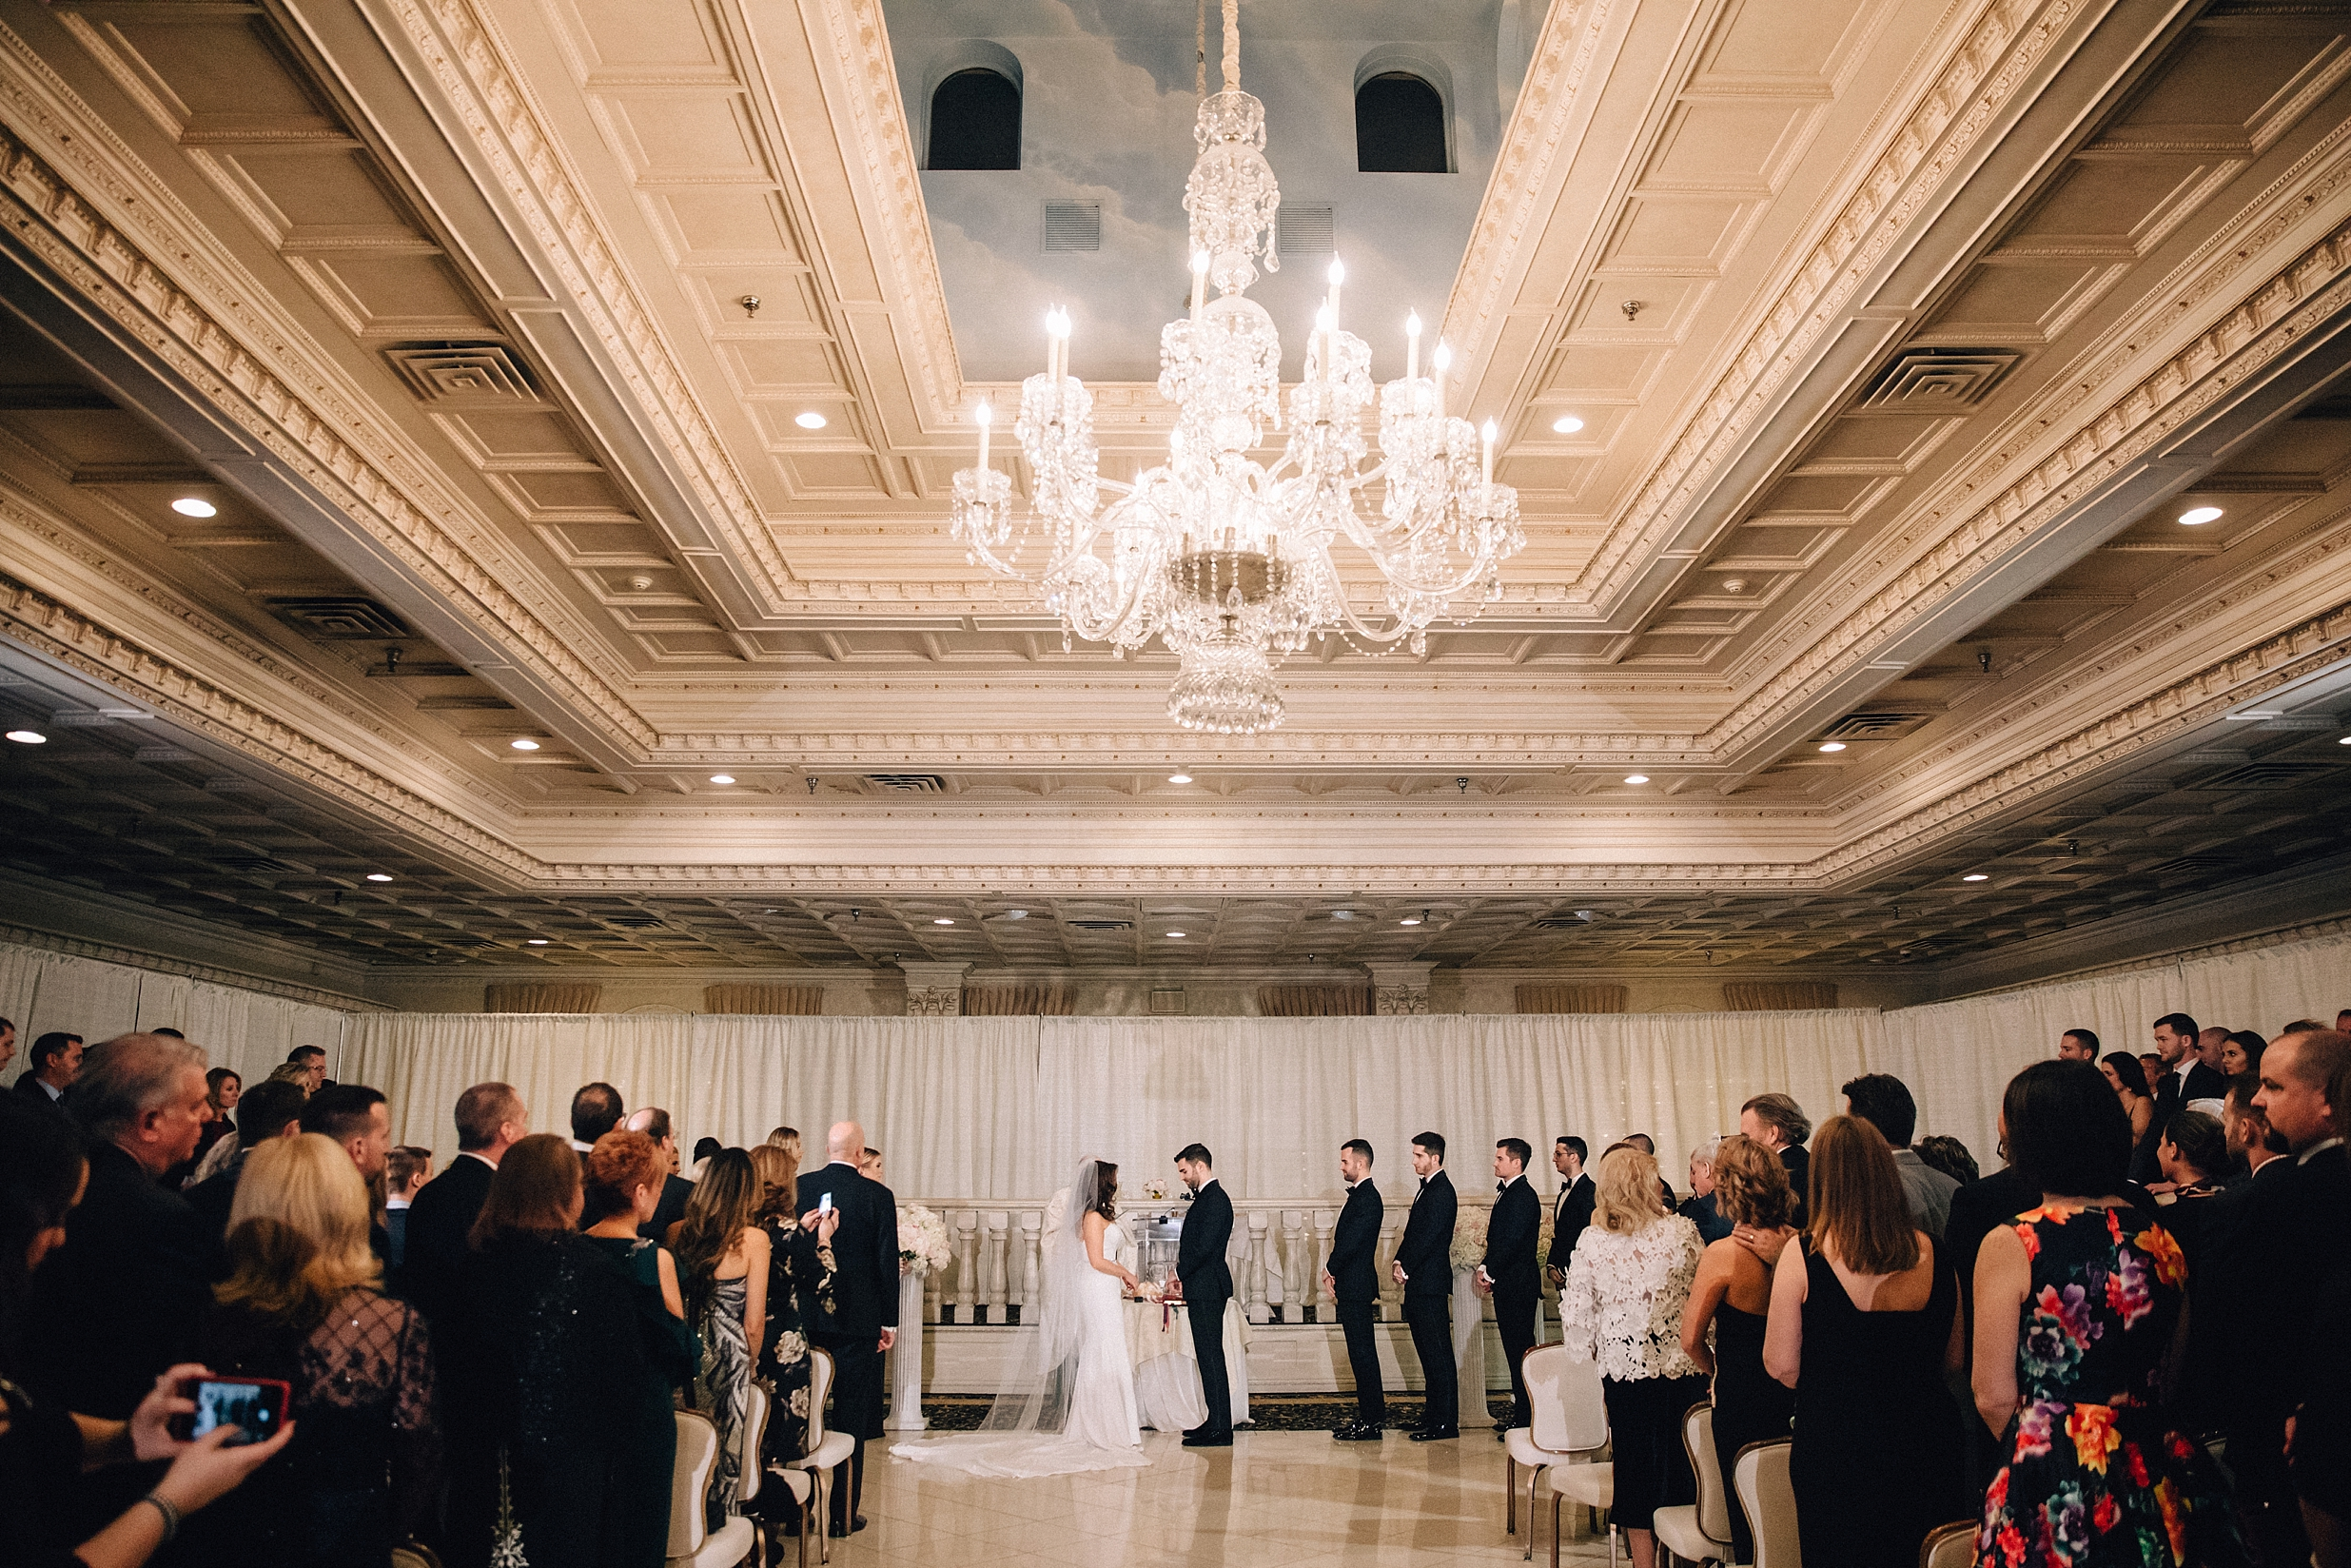 winter-wedding-snow-indoor-ceremony-nj-photographer_0027.jpg